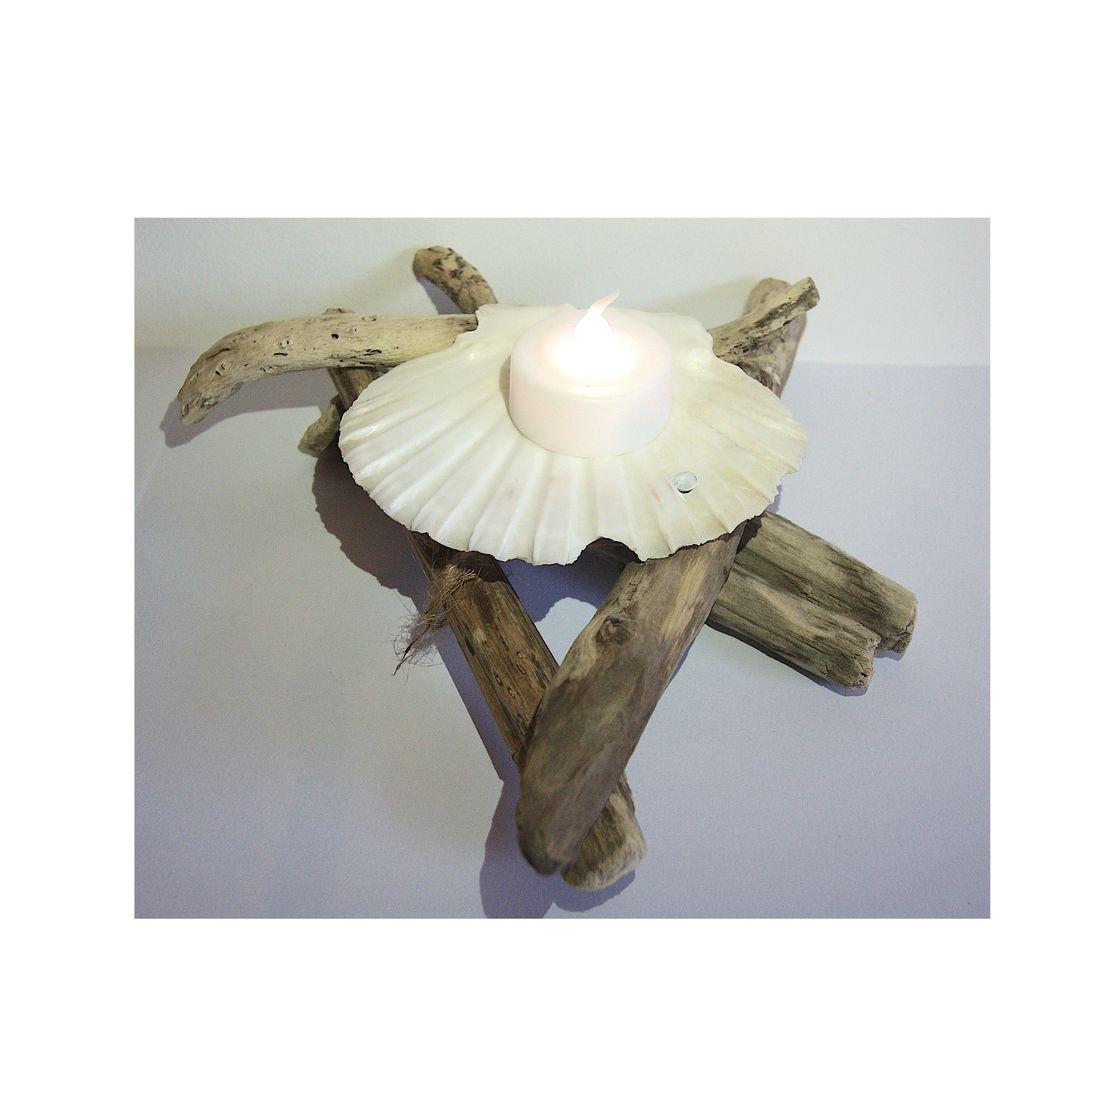 Driftwood candle tea light holder 7